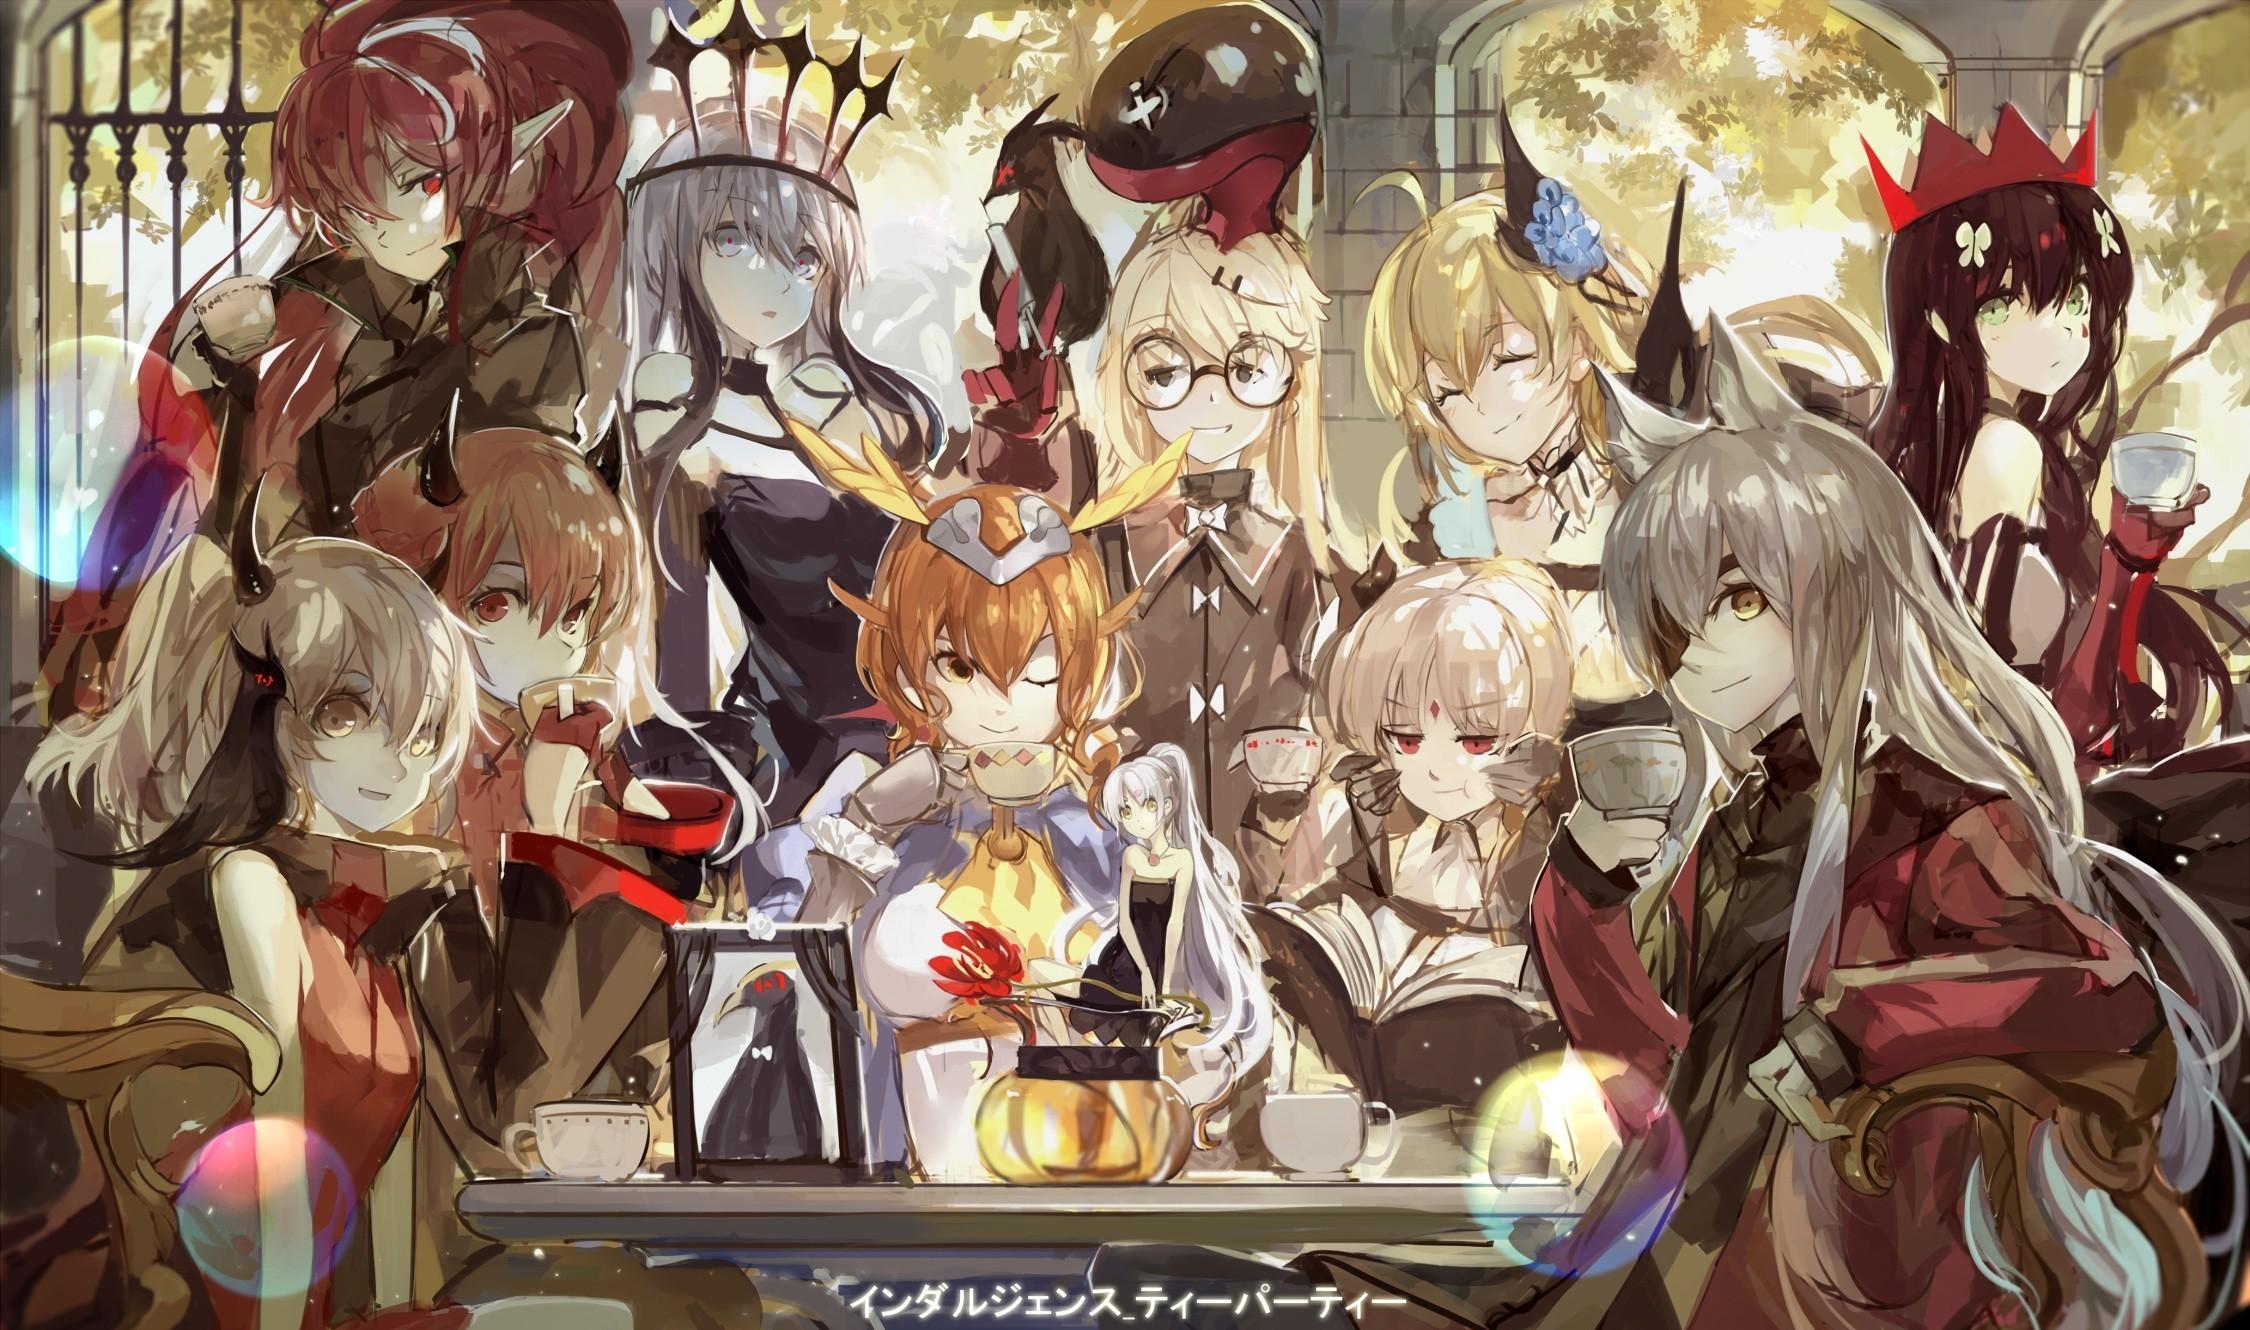 Pixiv fantasia computer wallpapers desktop backgrounds 1761x1000 -  10 Anime Pixiv Fantasia Fallen Kings Fk